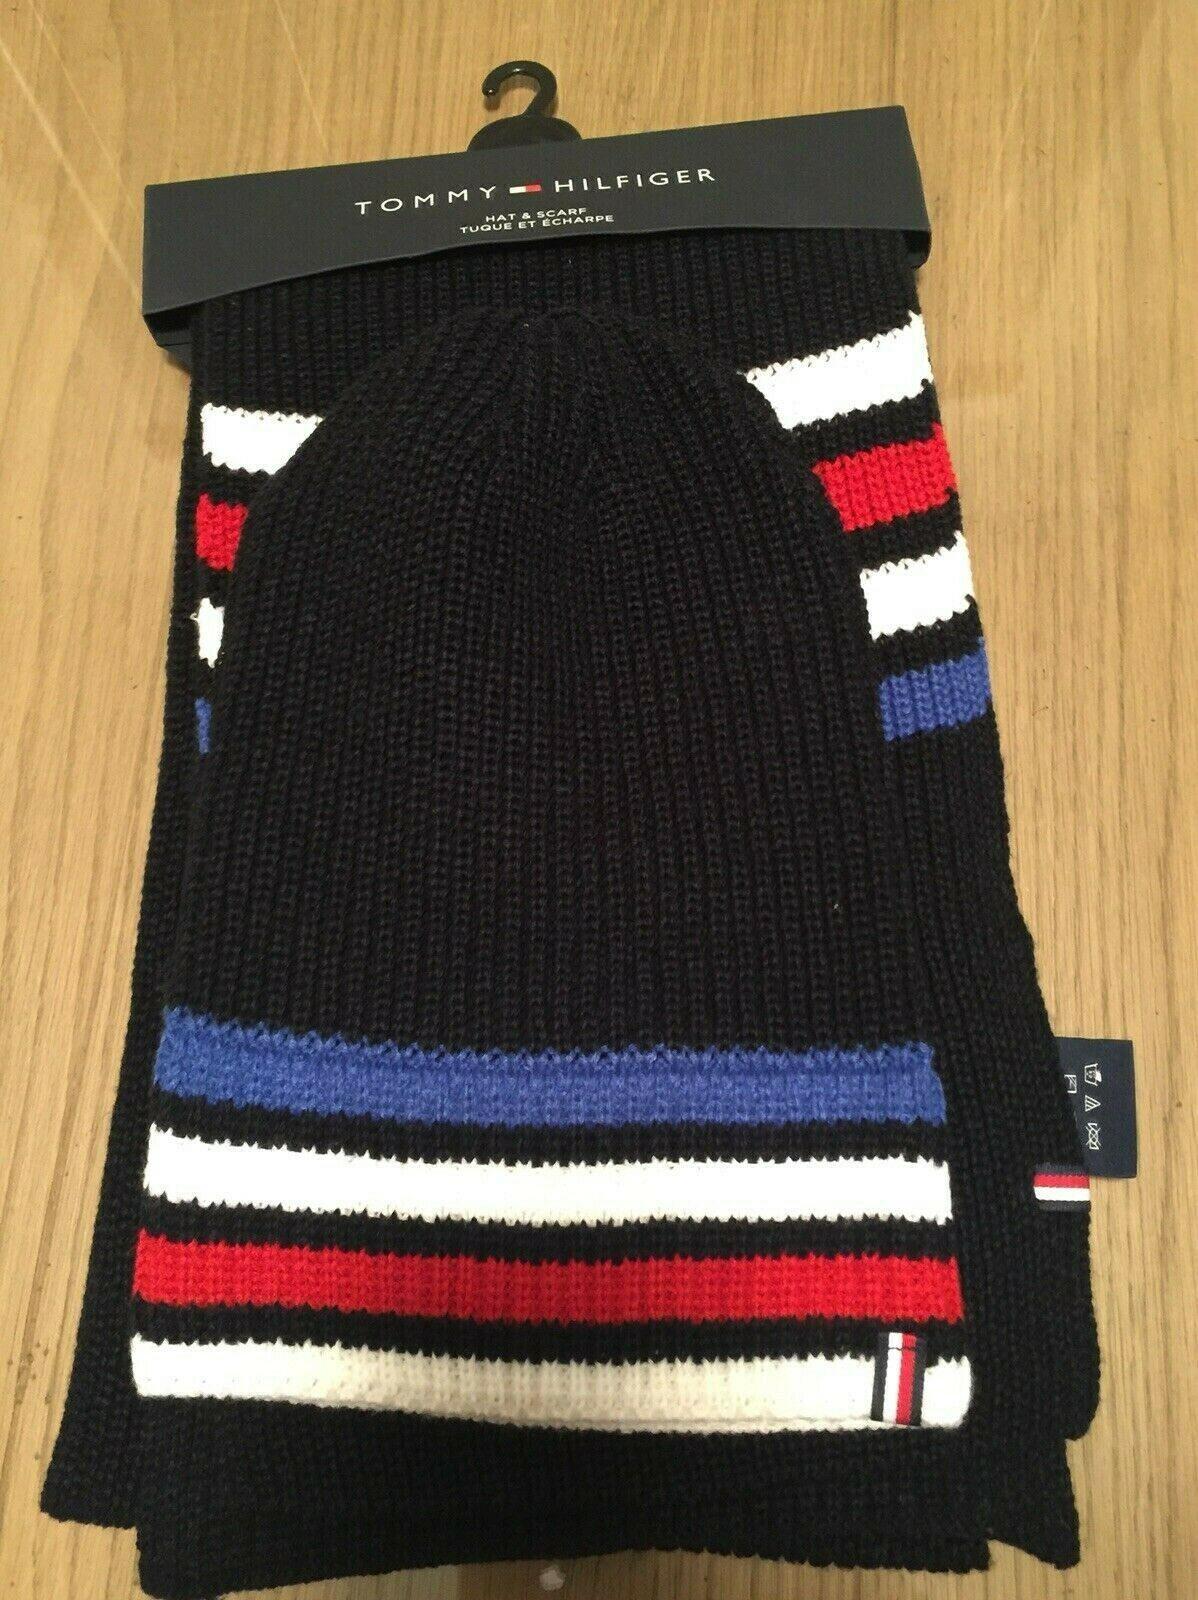 TOMMY HILFIGER Red White Black Knit Men's Scarf & Beanie Hat Set New